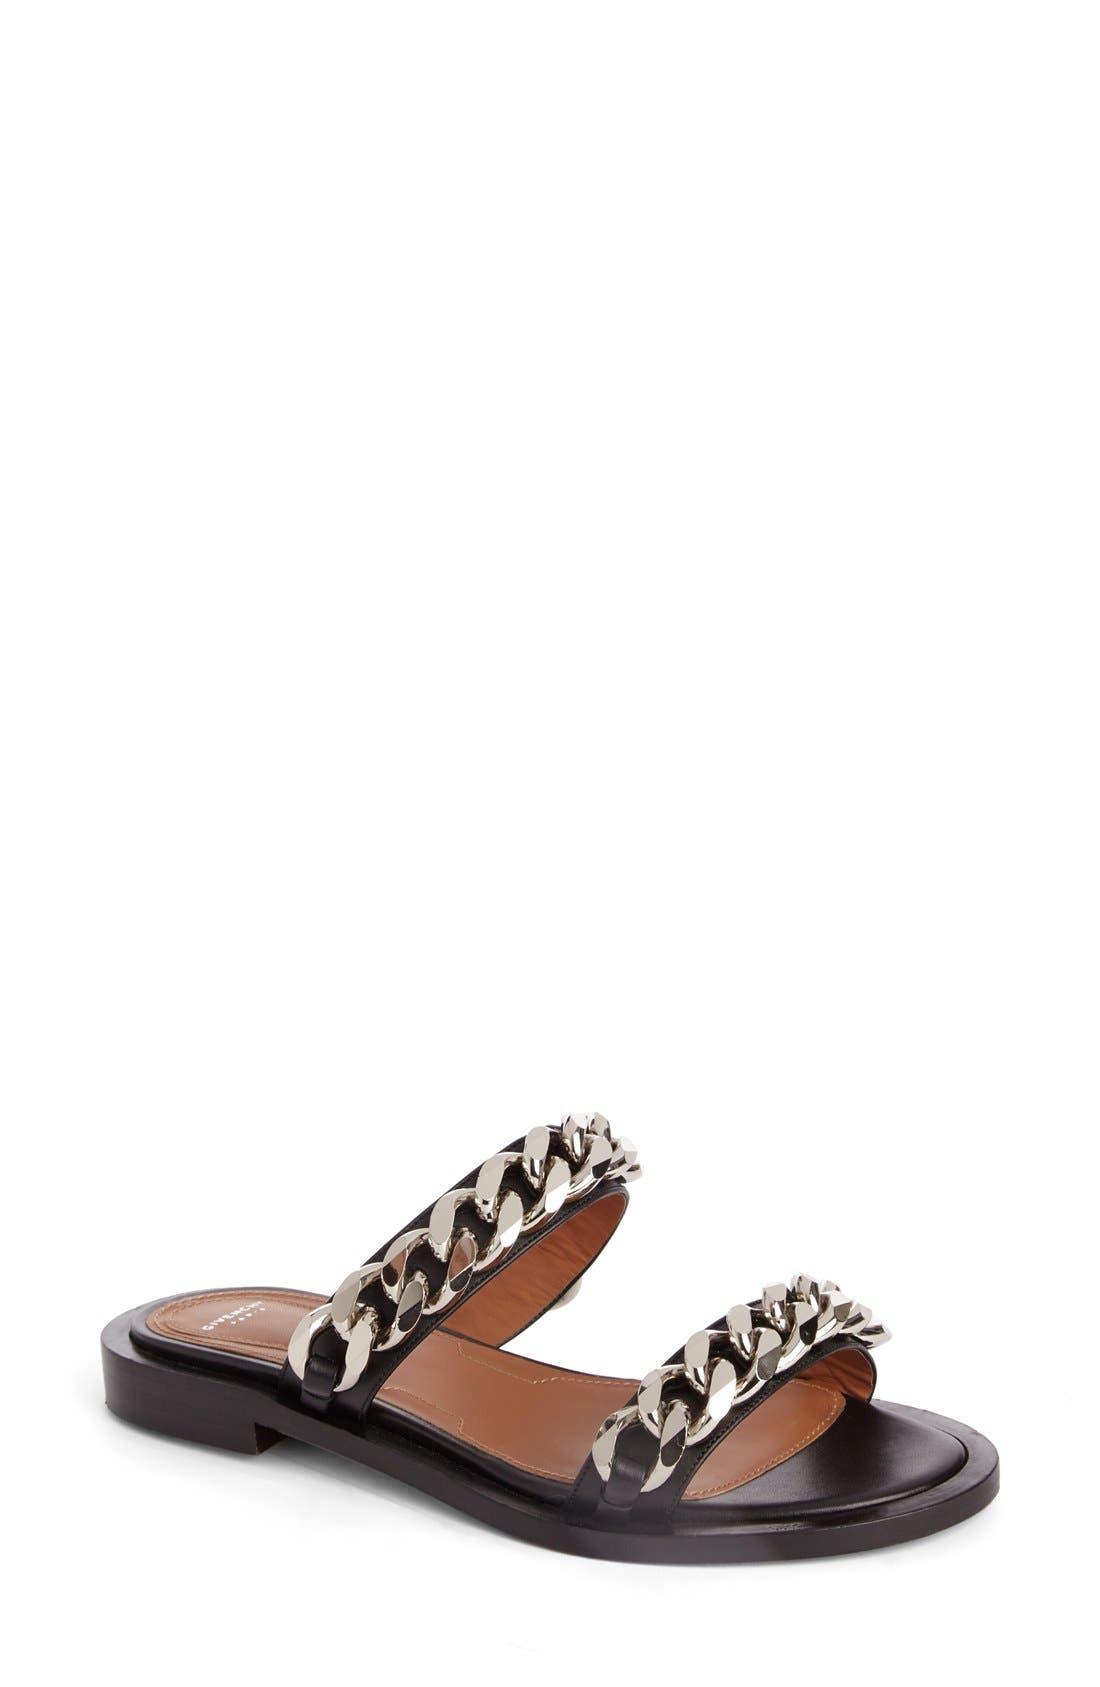 Main Image - Givenchy Double Chain Slide Sandal (Women)